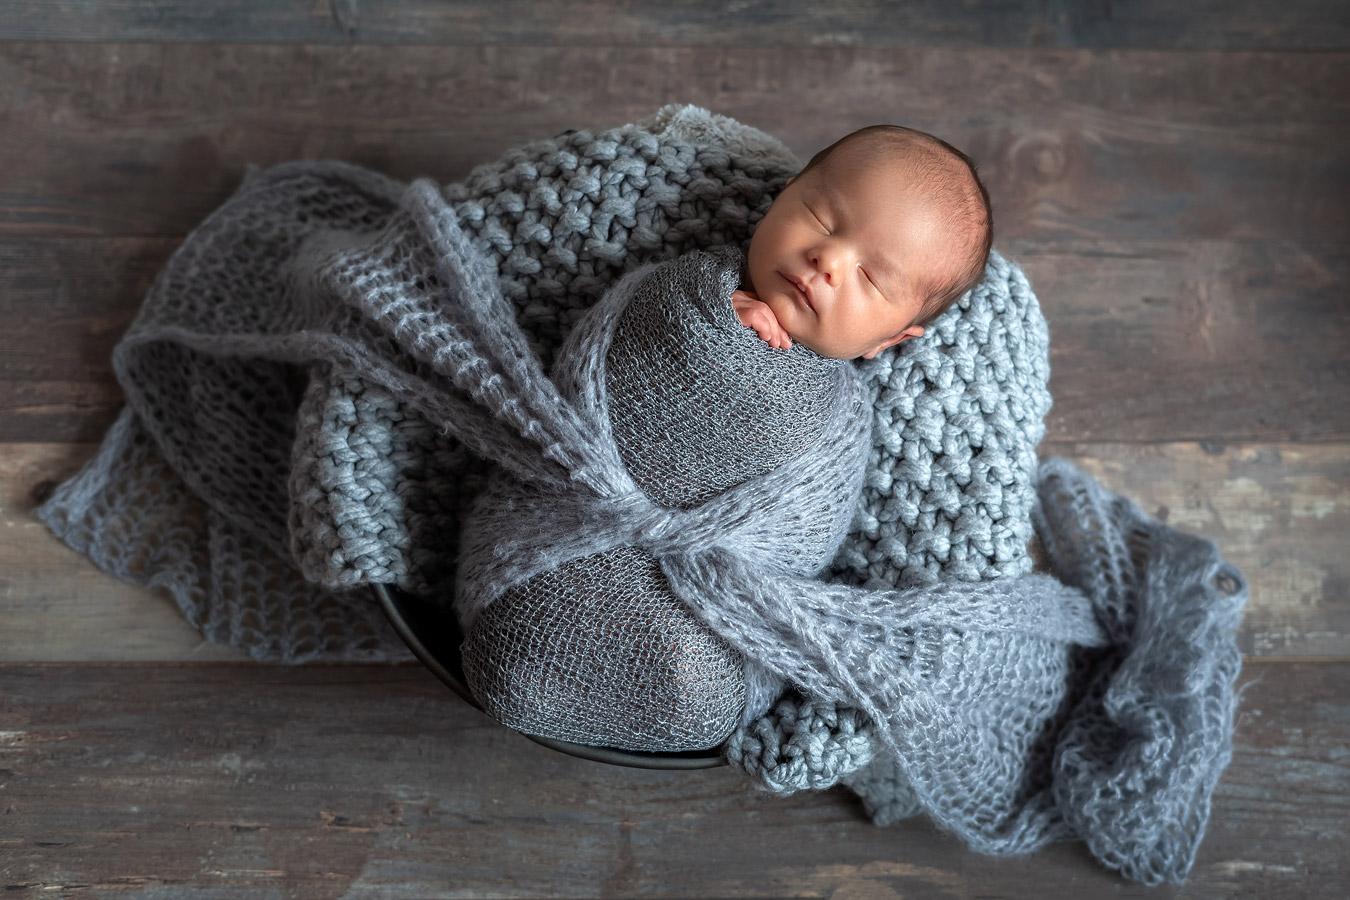 Babyfotograf Straubing | Newbornshooting | Familienfotograf | Straubing